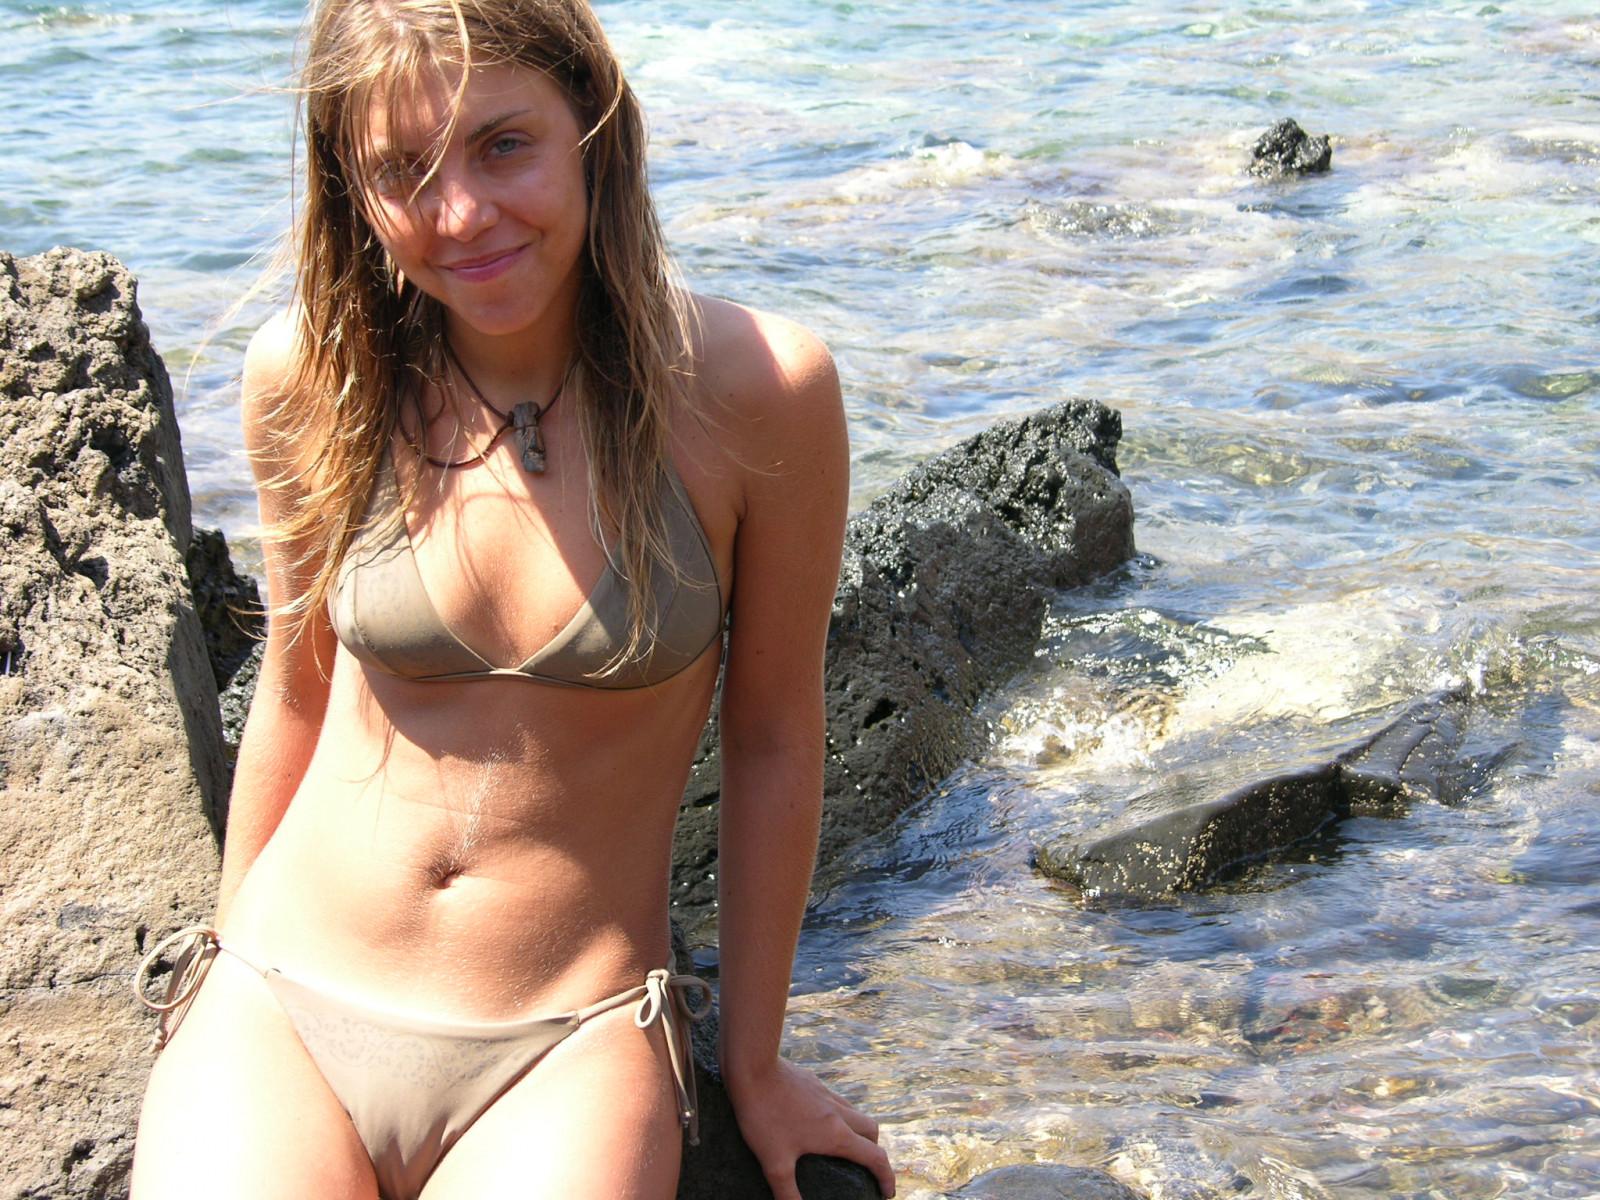 bikini camel toe